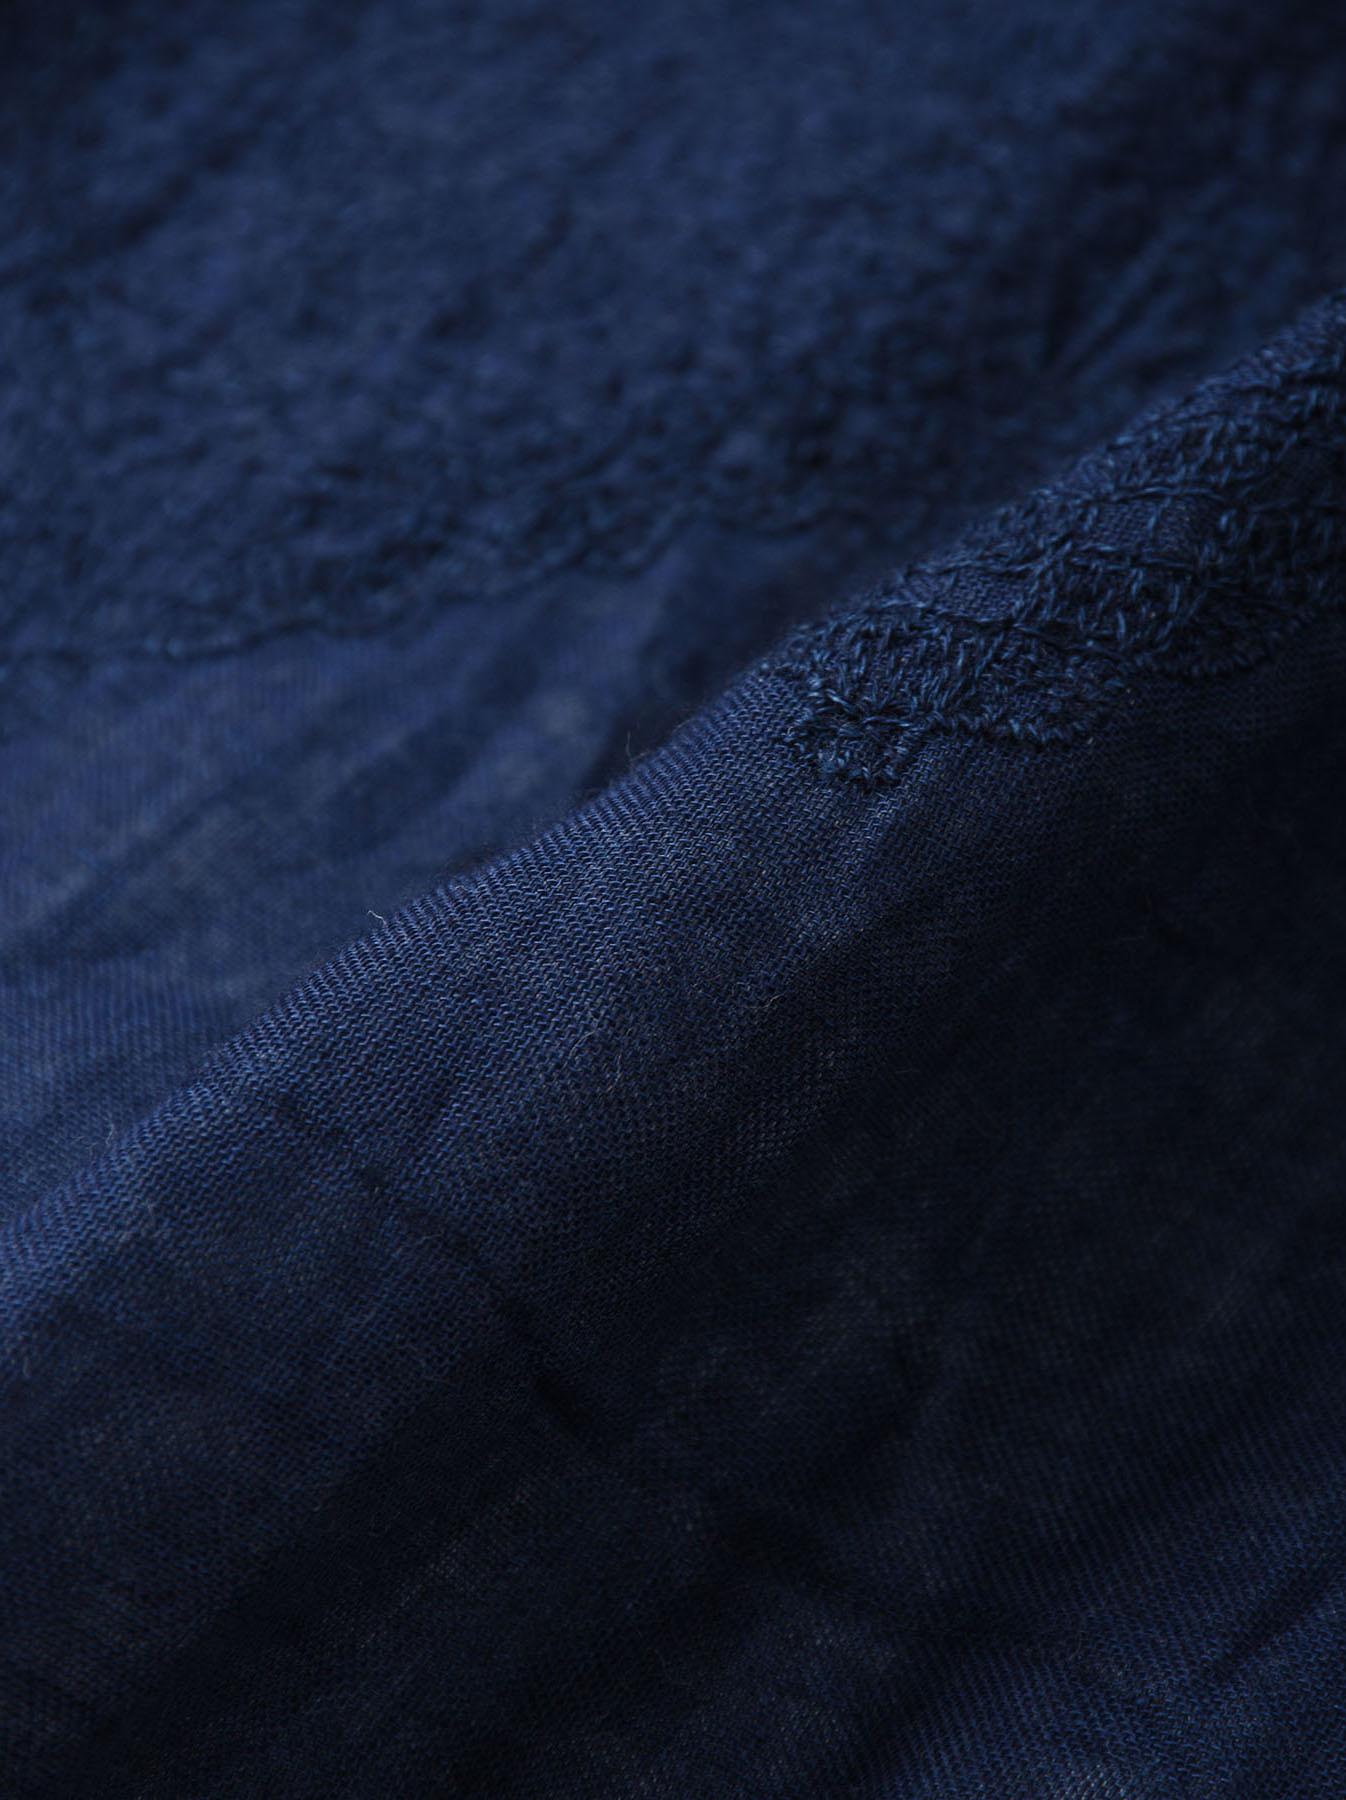 Indigo Double Cloth Lace Embroidery Dress-10